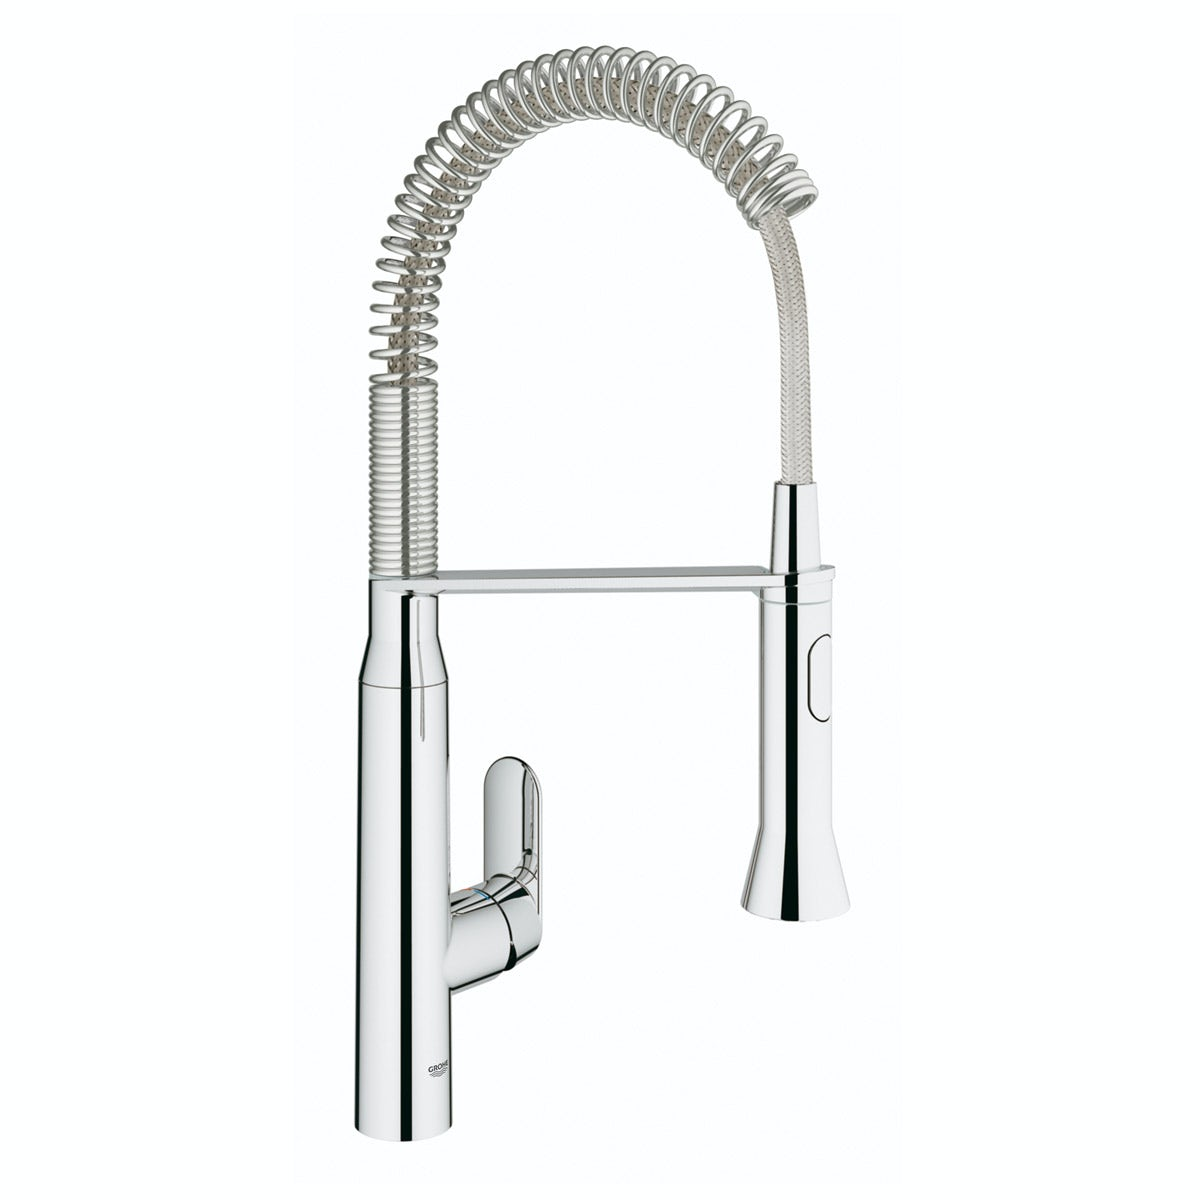 Grohe K7 Profi-spray medium kitchen tap with pull down spout